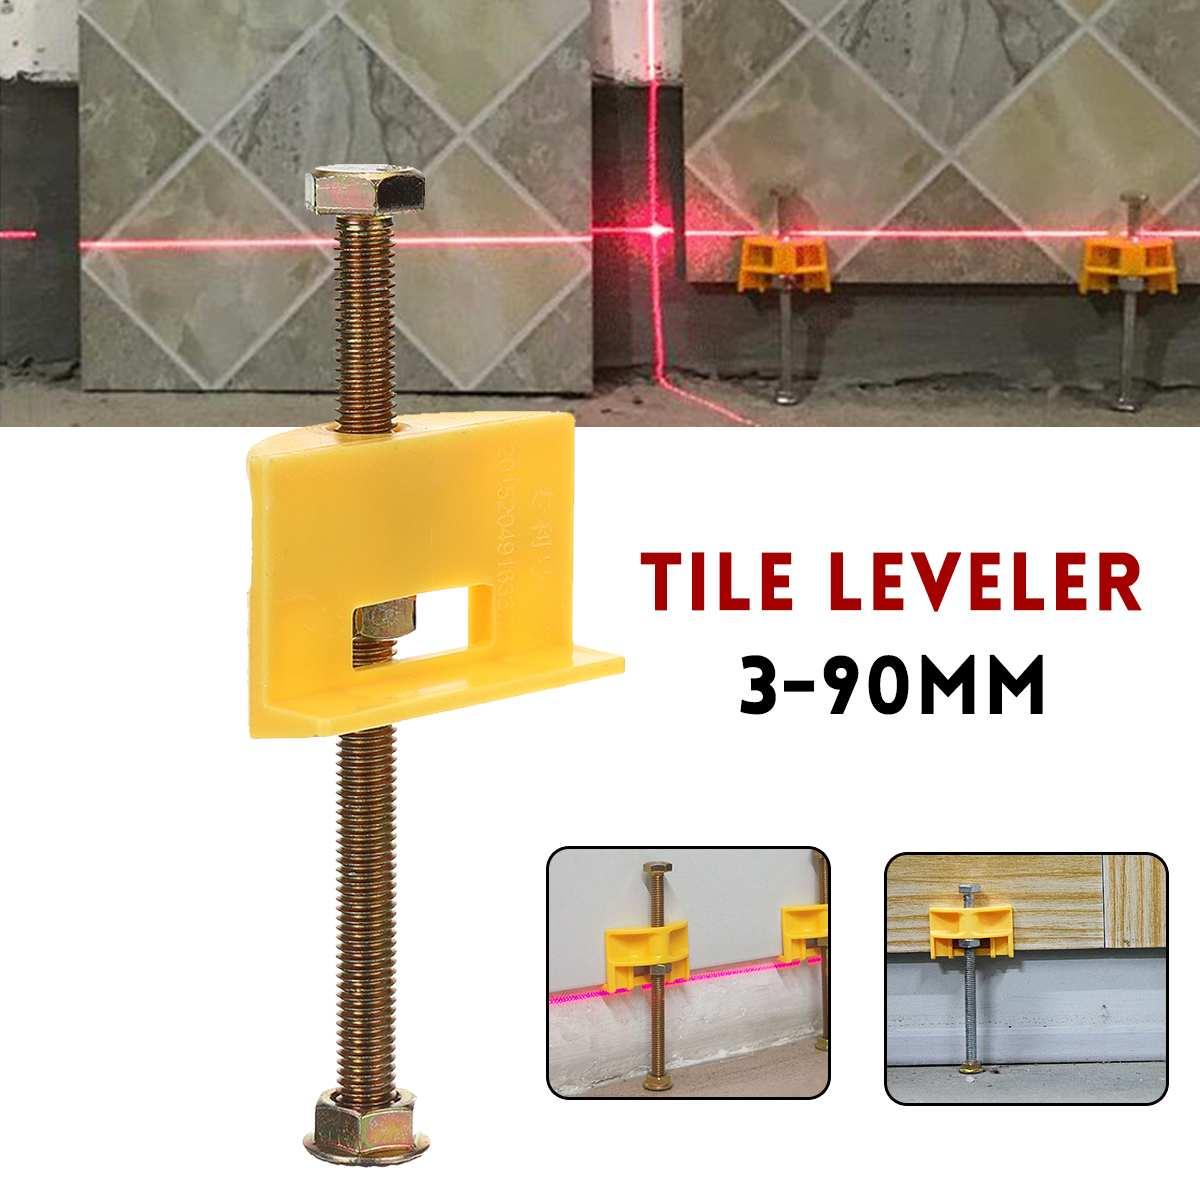 Manual Tile Locator Wall Tiles Regulator Height Adjustment Positioner Leveler Ceramic Fine Thread Rising Construction Tool 10Pcs